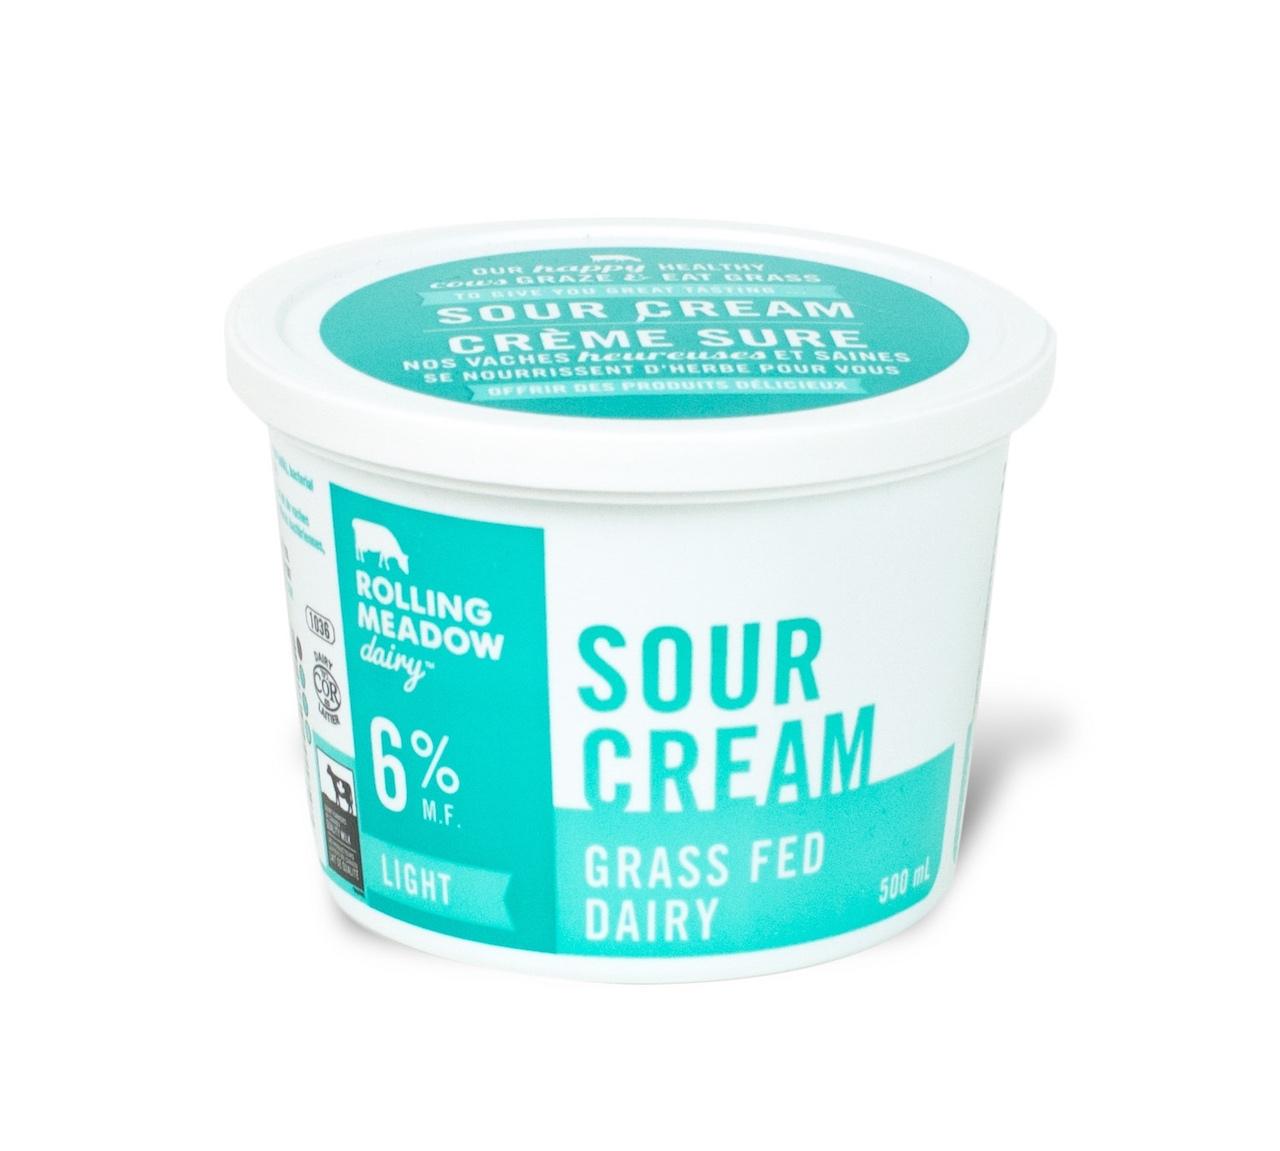 6% Light Sour Cream